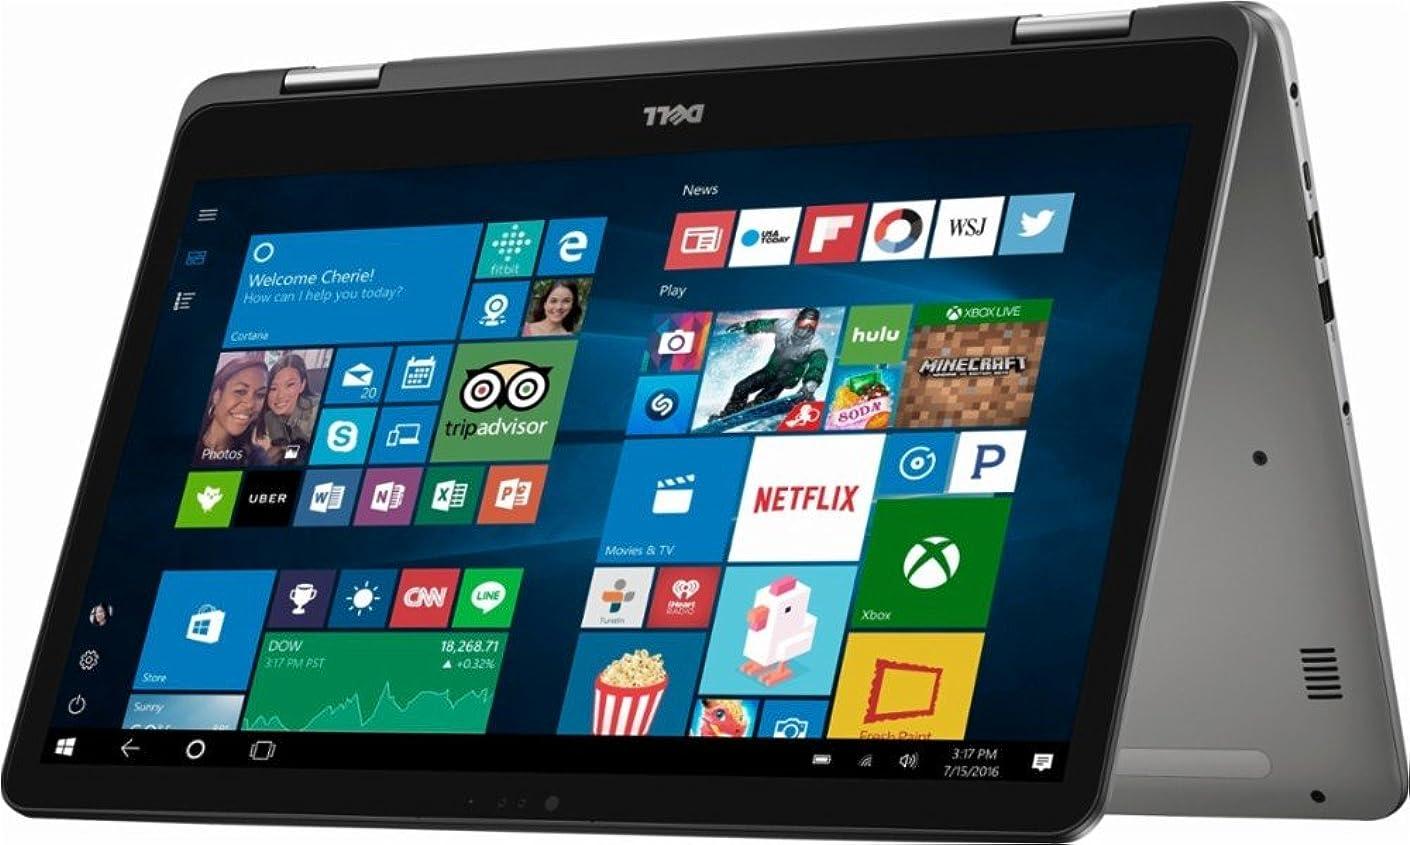 2019 Premium Flagship Dell Inspiron 17 7000 17.3 Inch FHD Touchscreen Laptop (Intel Core i7-8550U up to 4.0GHZ, 16GB DDR4 RAM, 1TB SSD + 1TB HDD, Backlit Keyboard, Bluetooth, WiFi, HDMI, Windows 10)